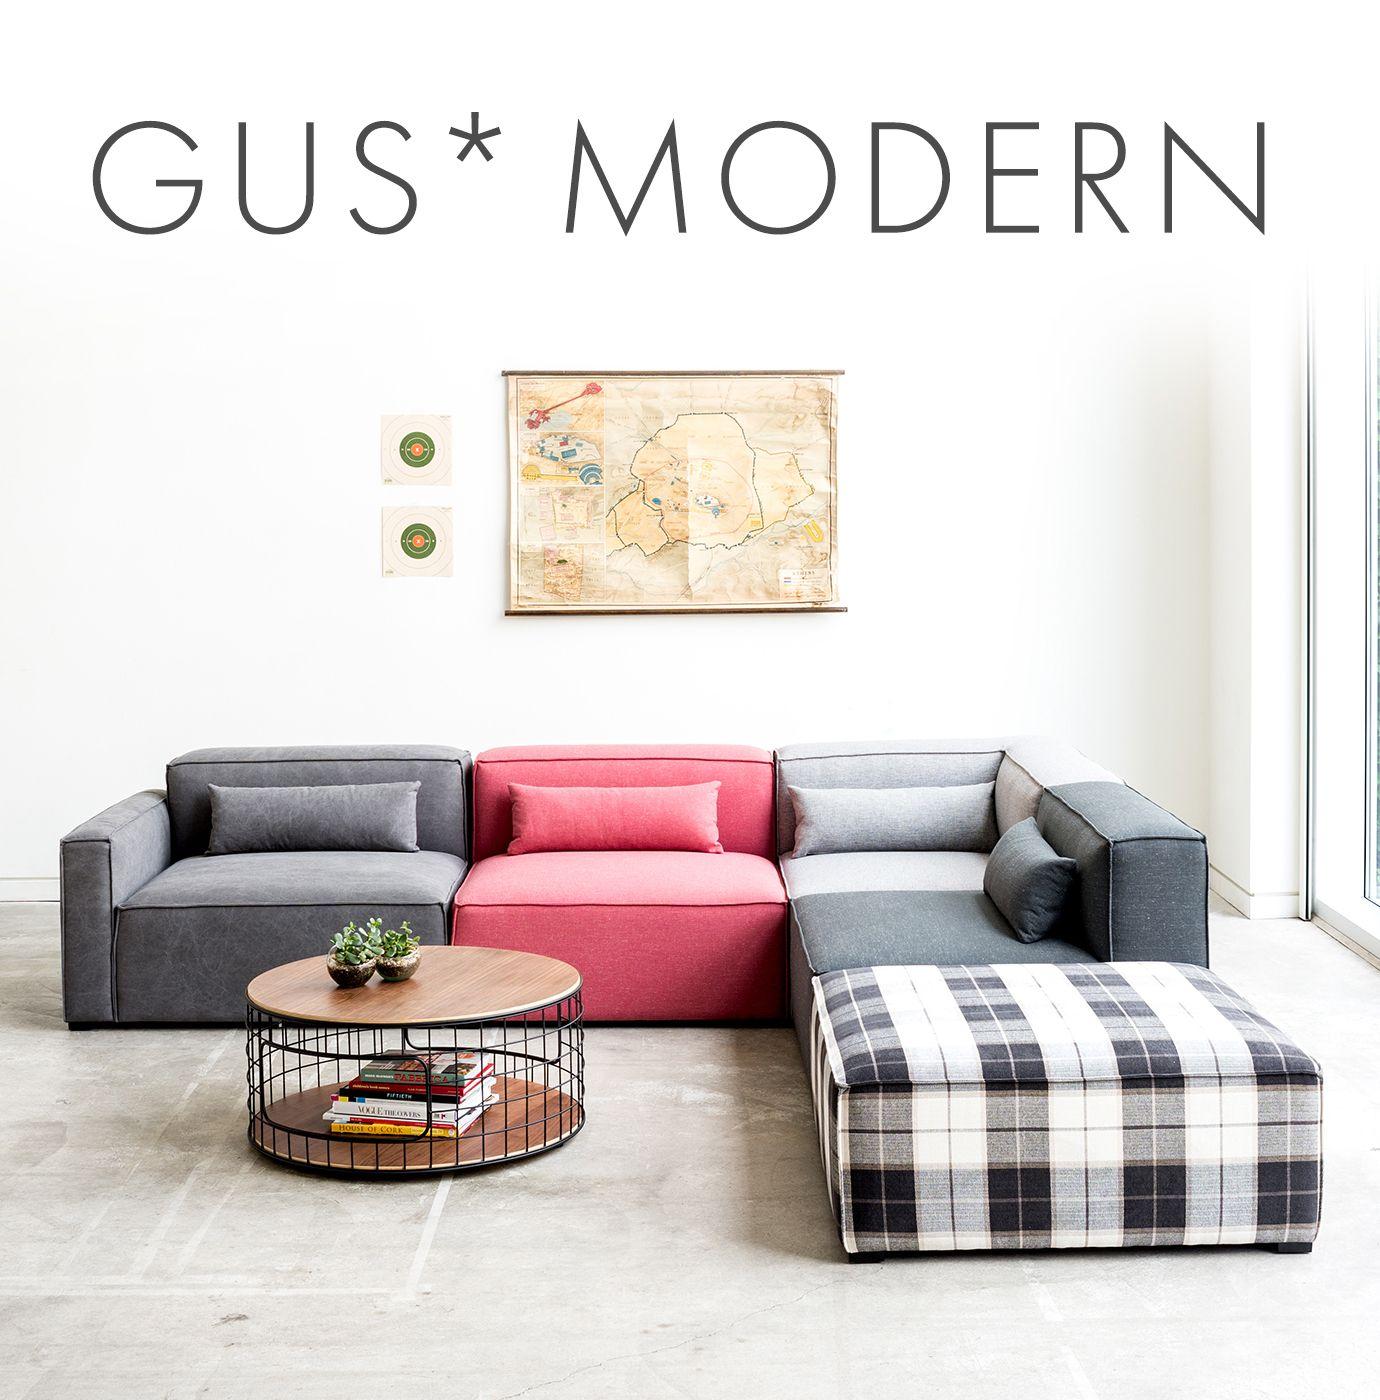 gus modern sofa sale repair sagging springs upholstery save 20 through august 14